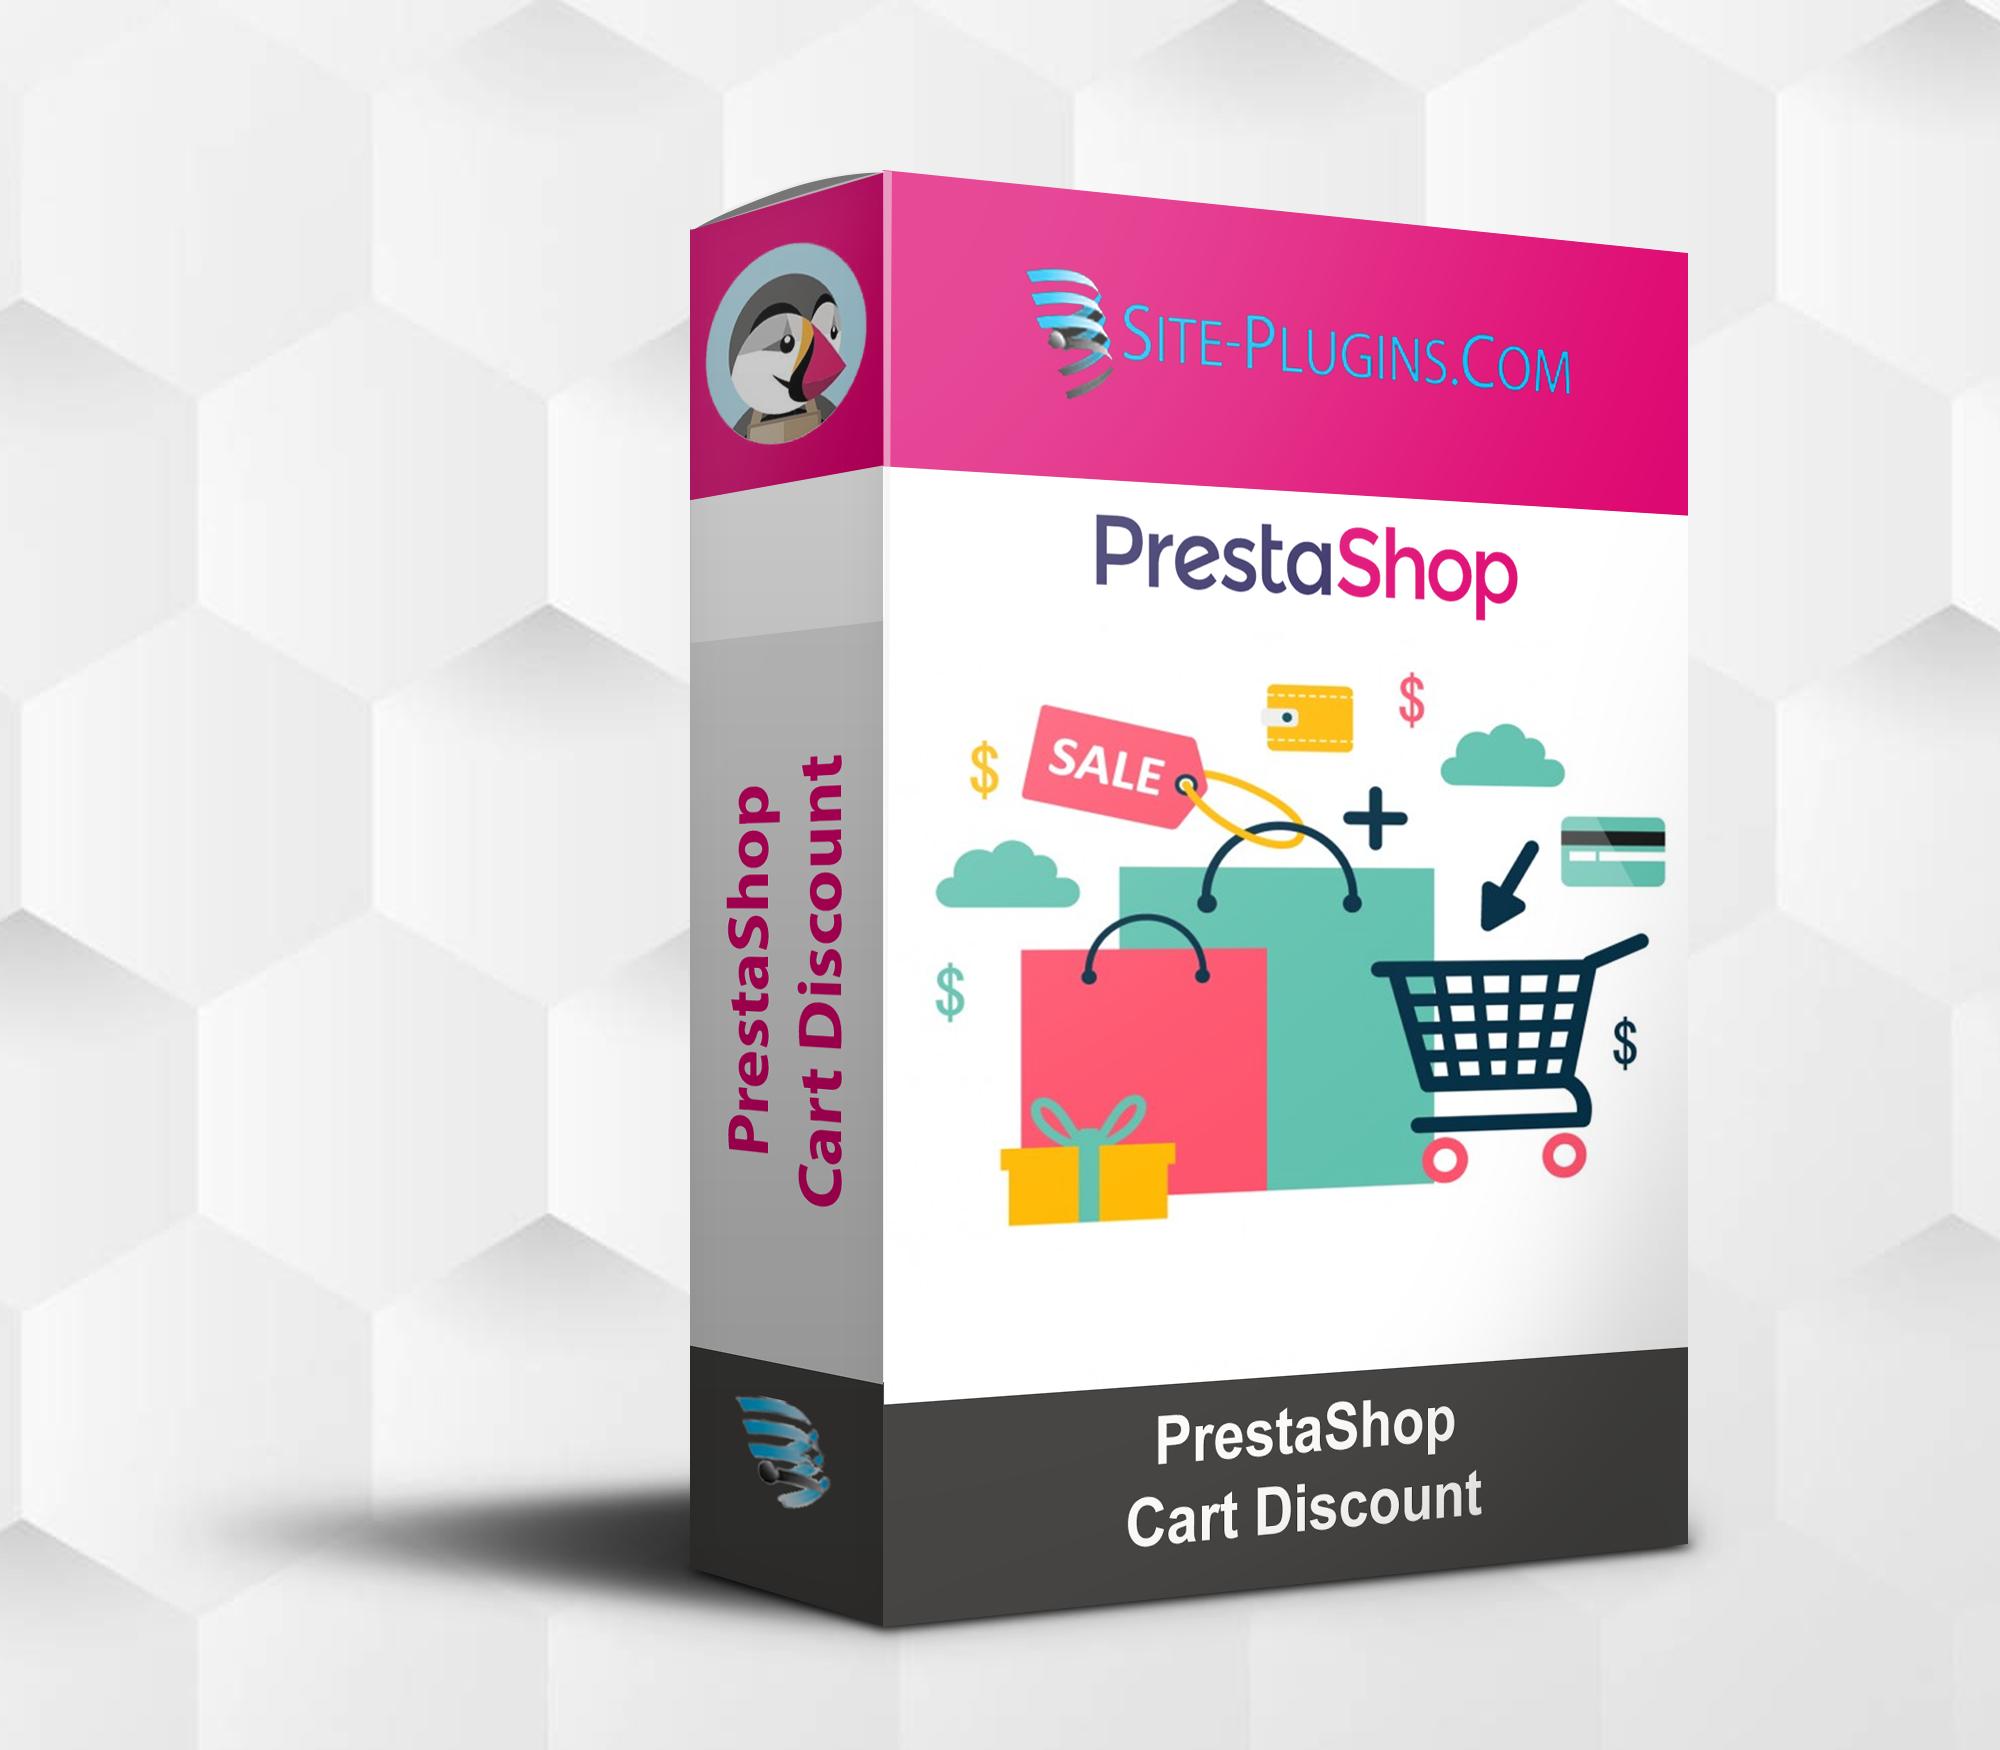 PrestaShop Cart Discount